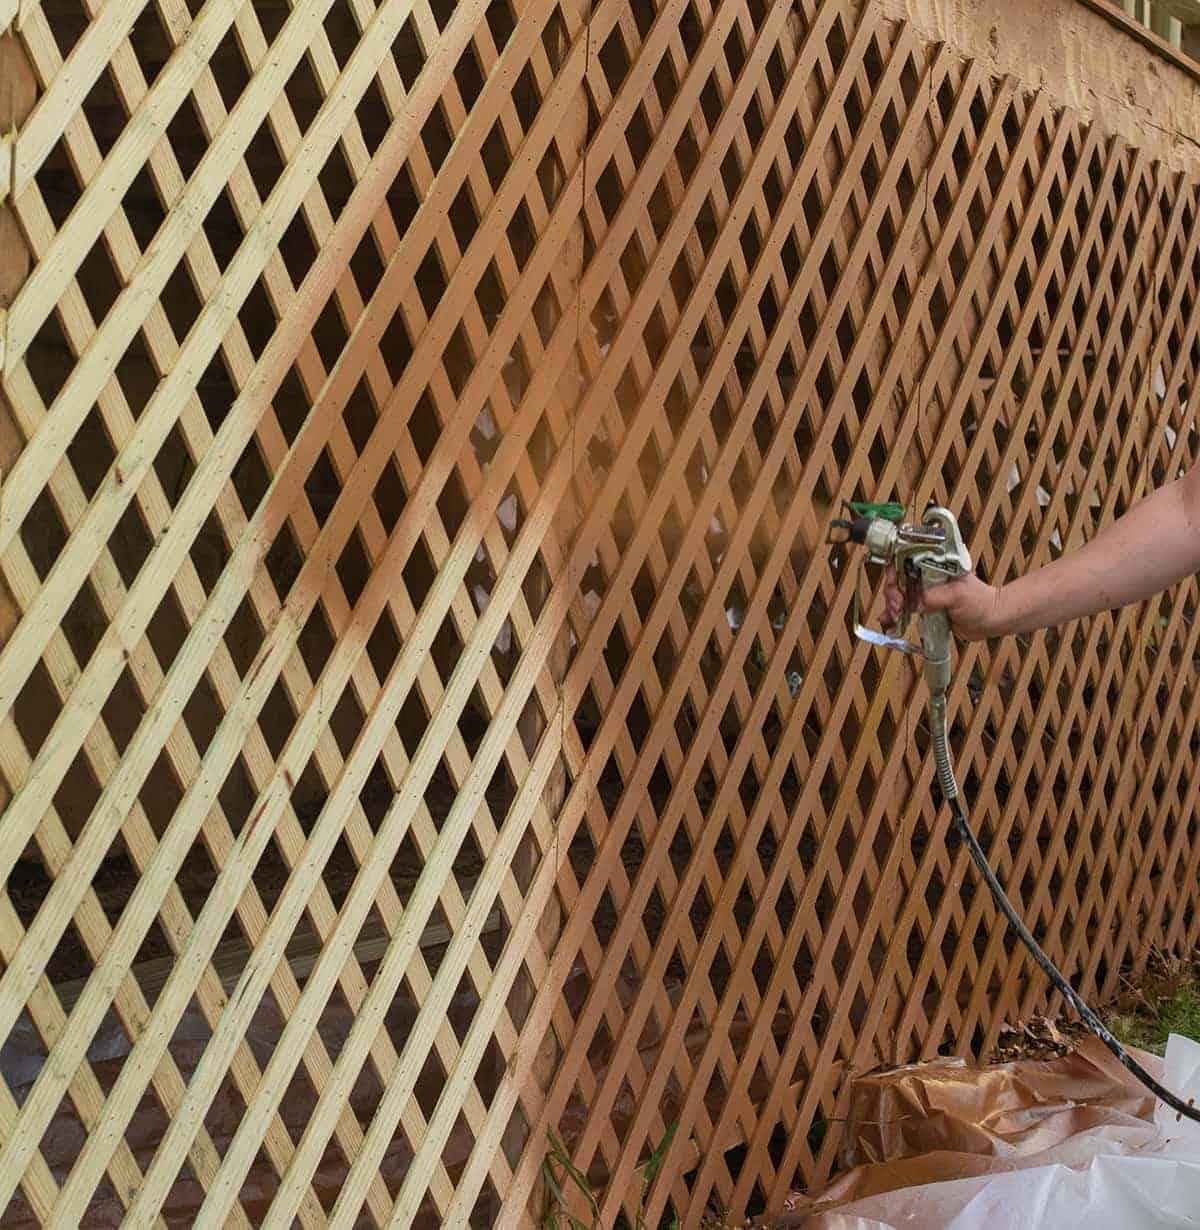 How to Paint Lattice the Easy Way